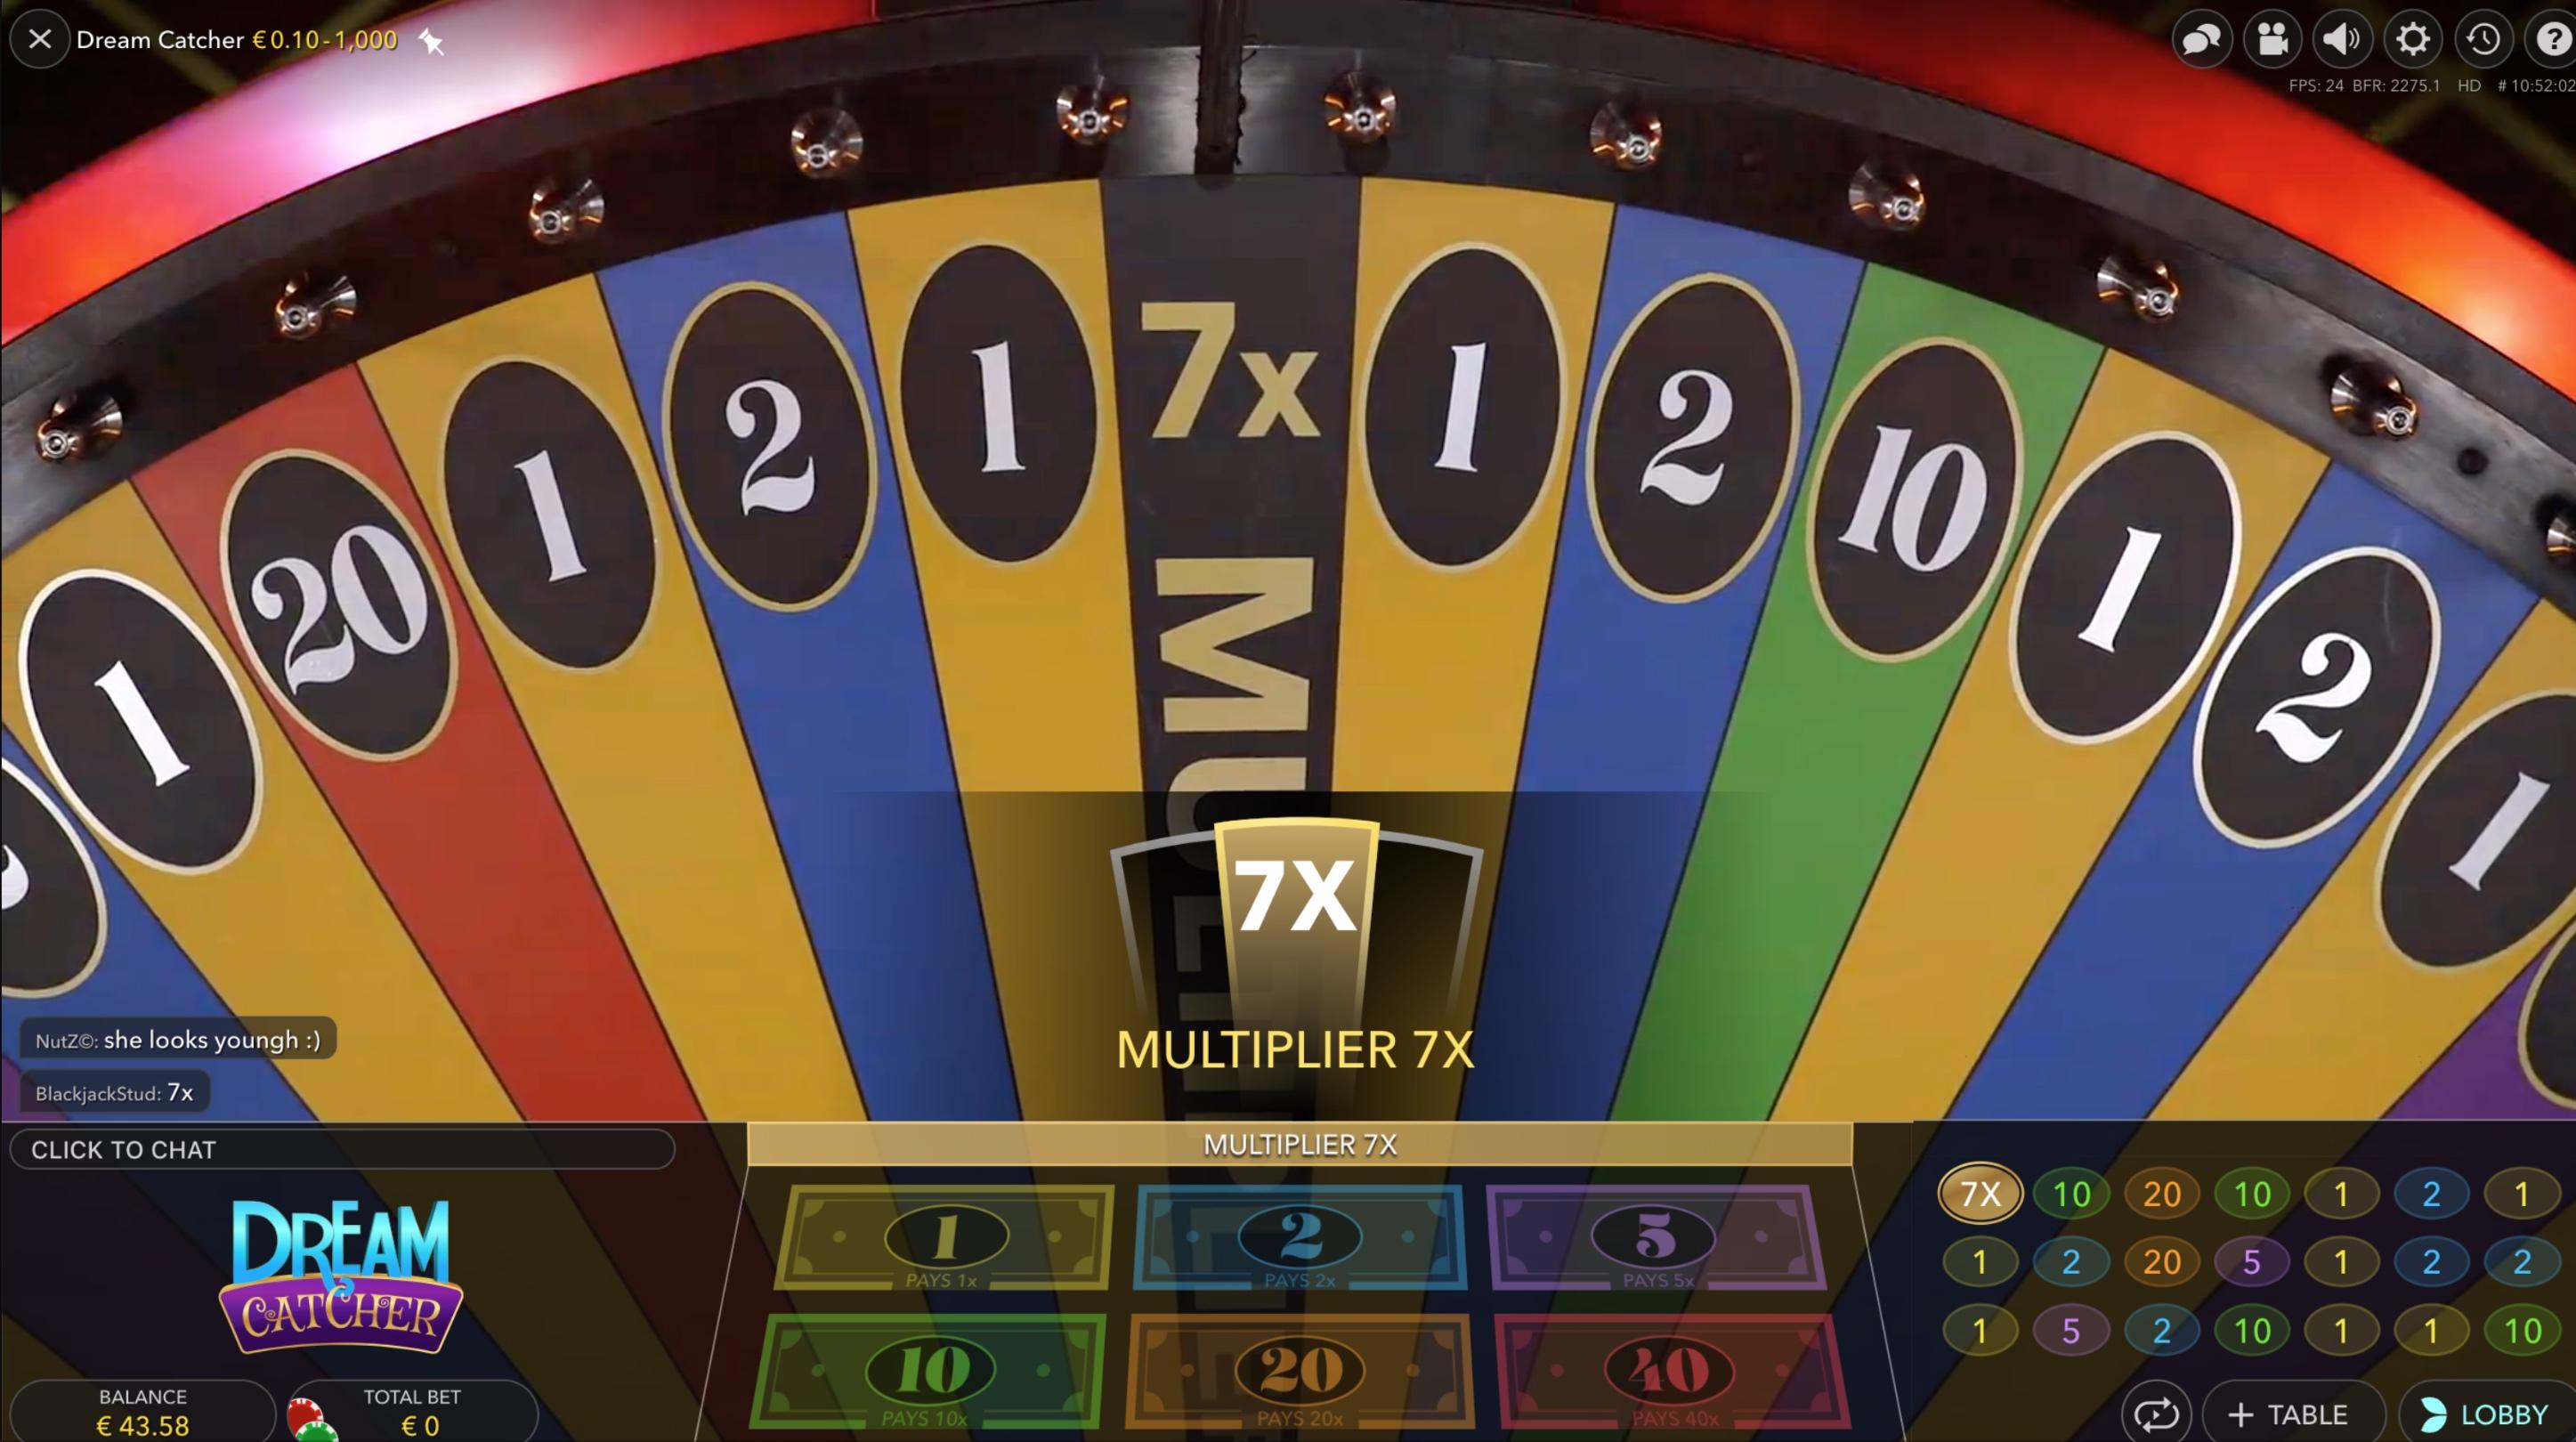 evolution gaming dream catcher money wheel_rules_strategie